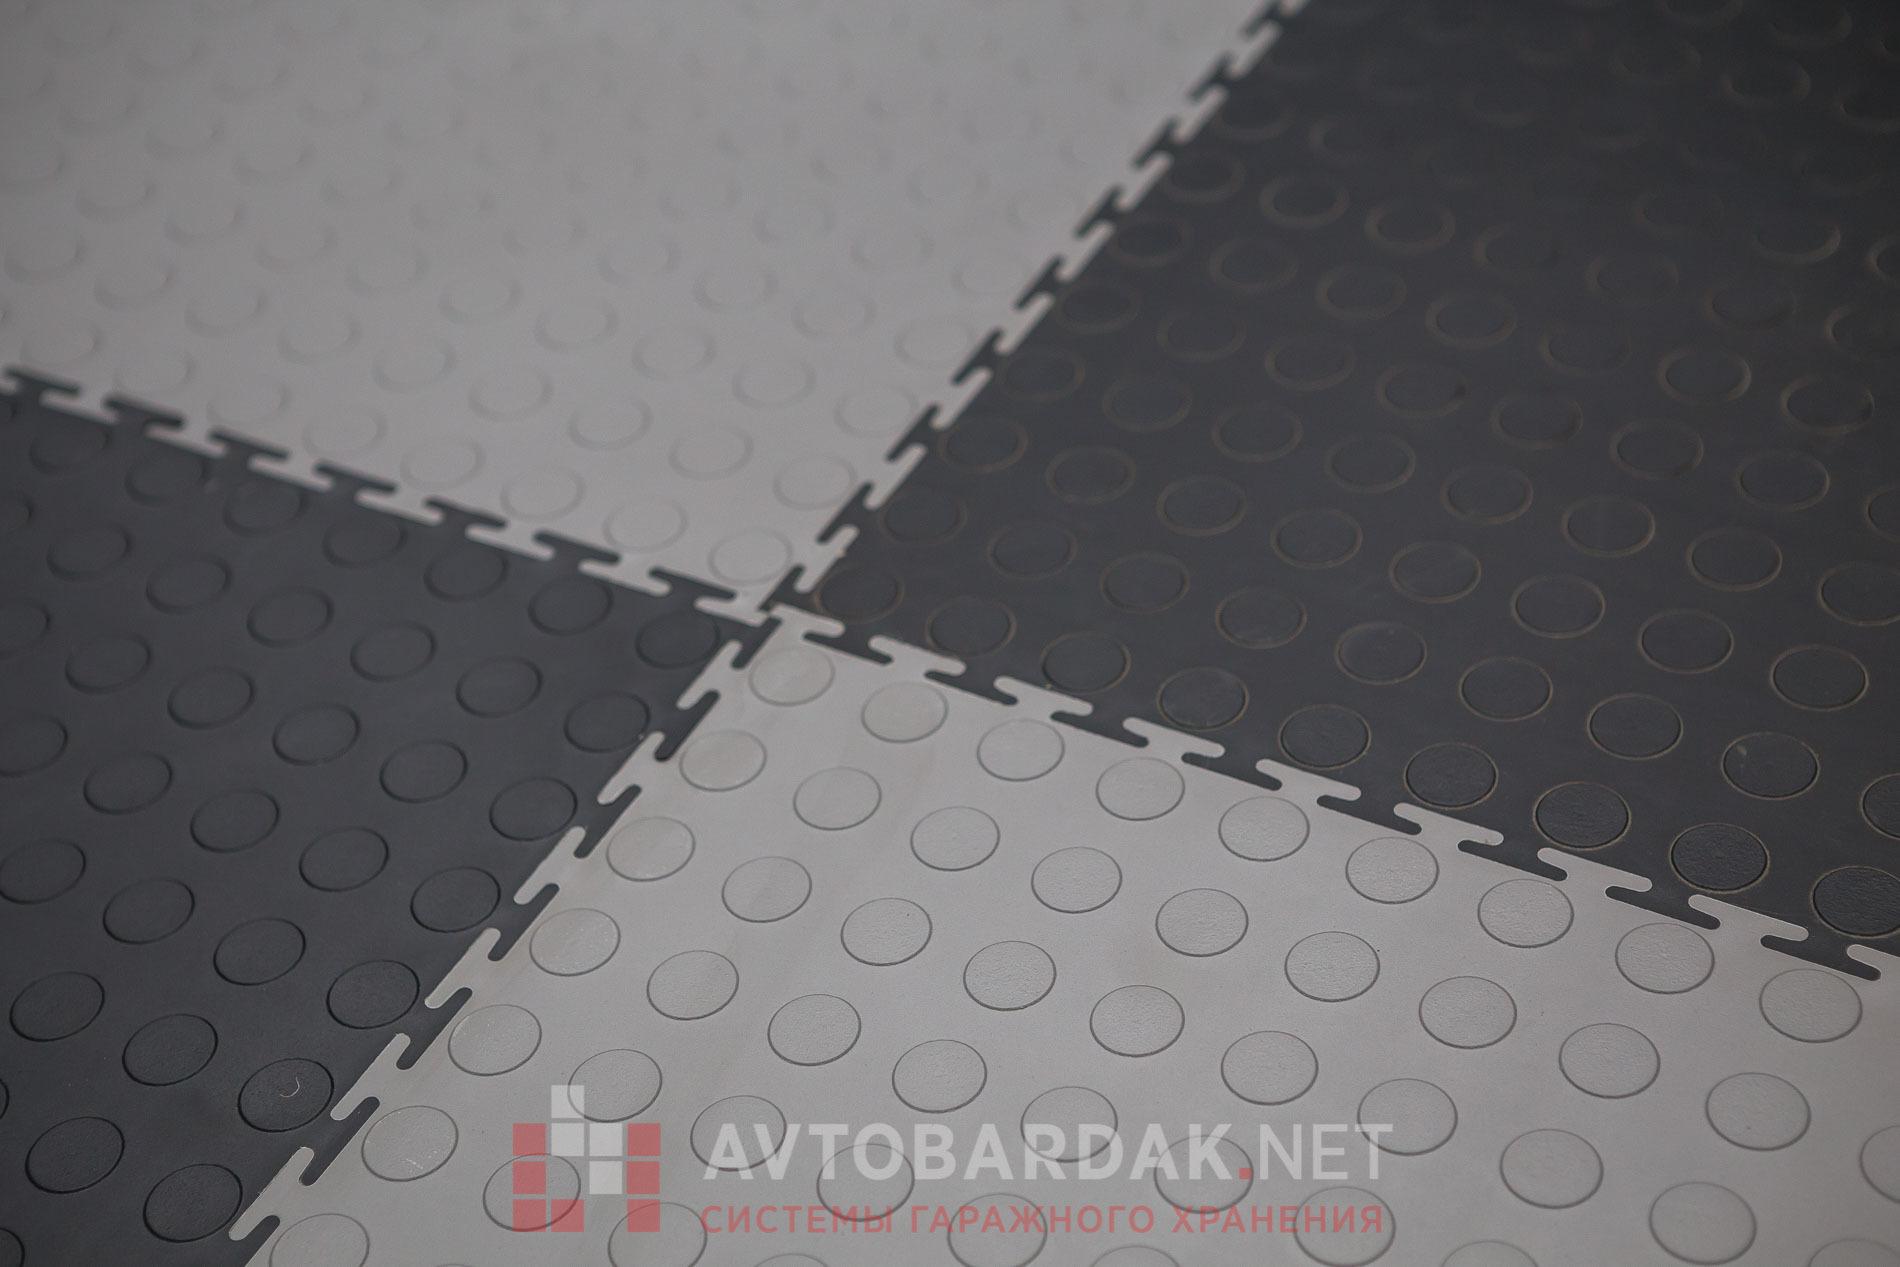 Плитка ПВХ 500х500 мм на пол  для гаража. Черная, толщина 7 мм.